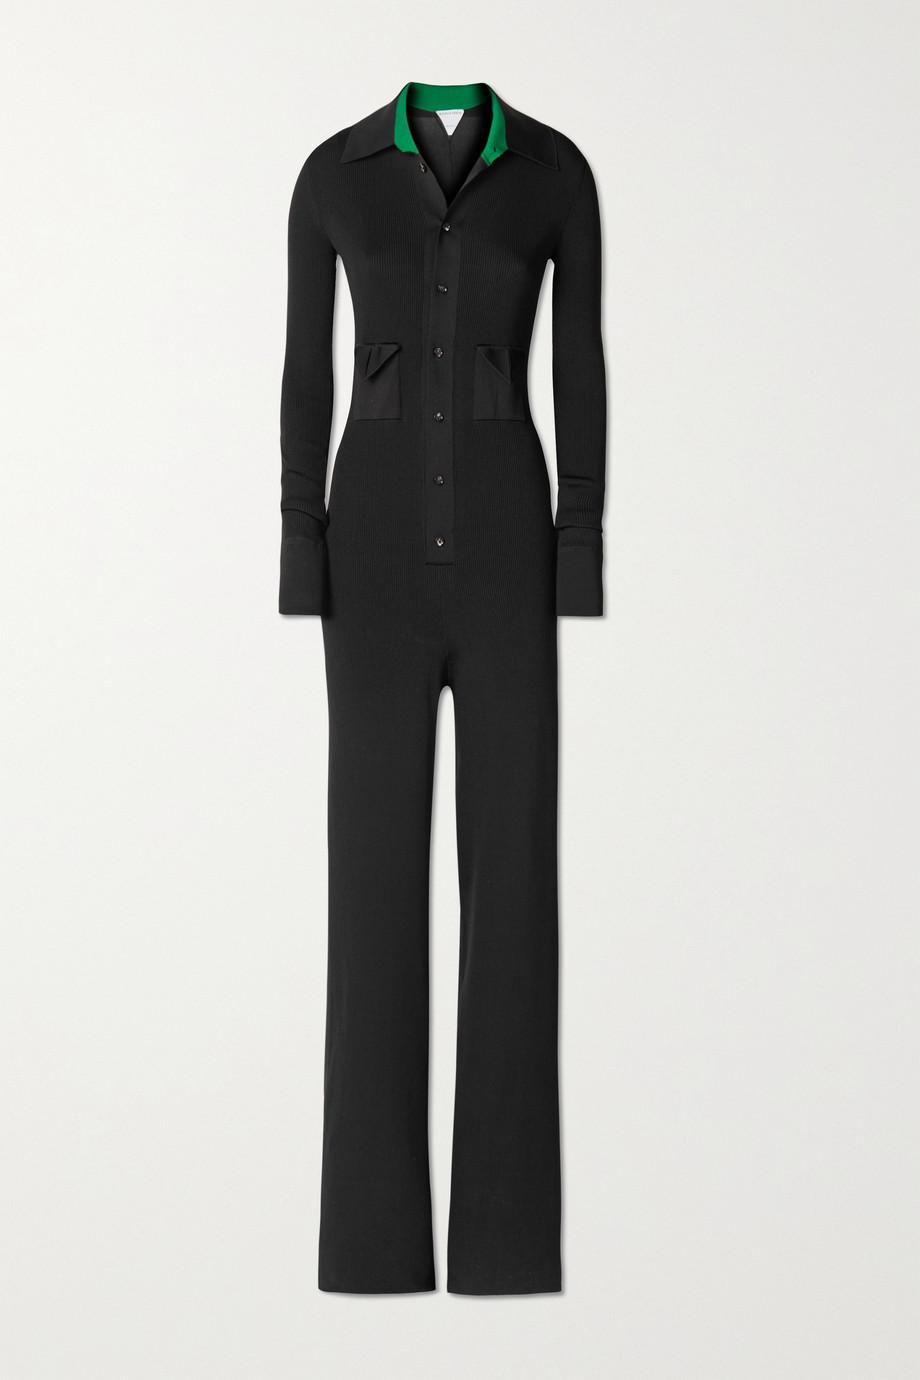 Bottega Veneta Ribbed silk-blend jumpsuit